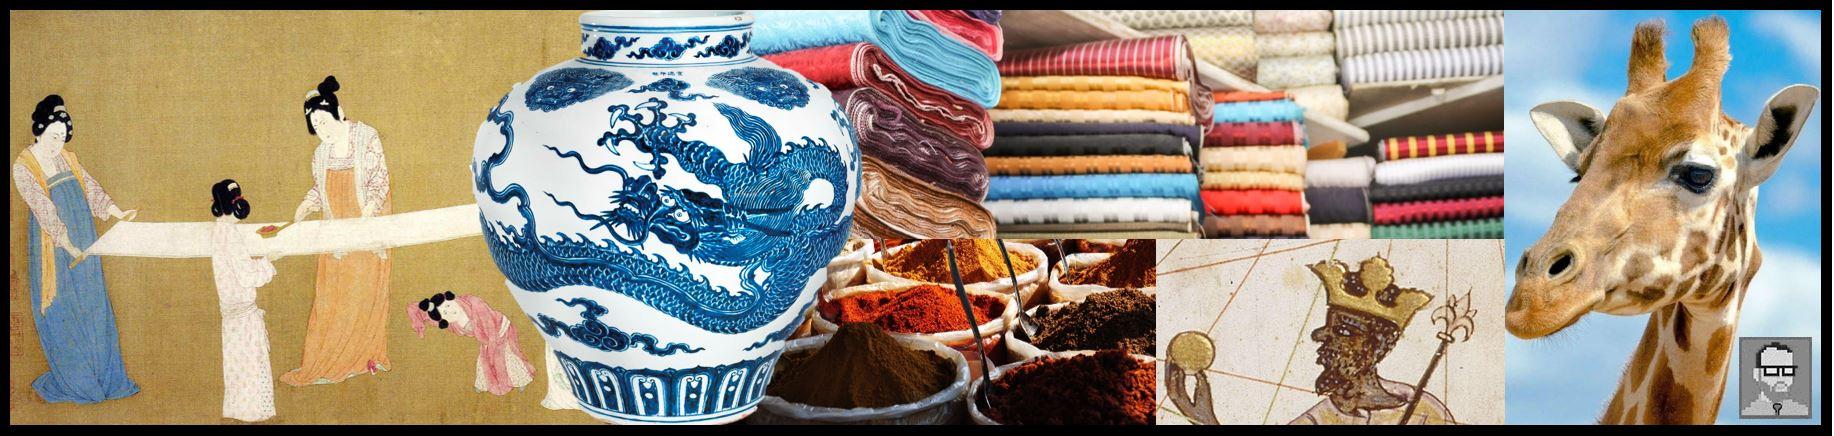 Inter Regional trade in luxury goods freemanpedia ap world modern.JPG